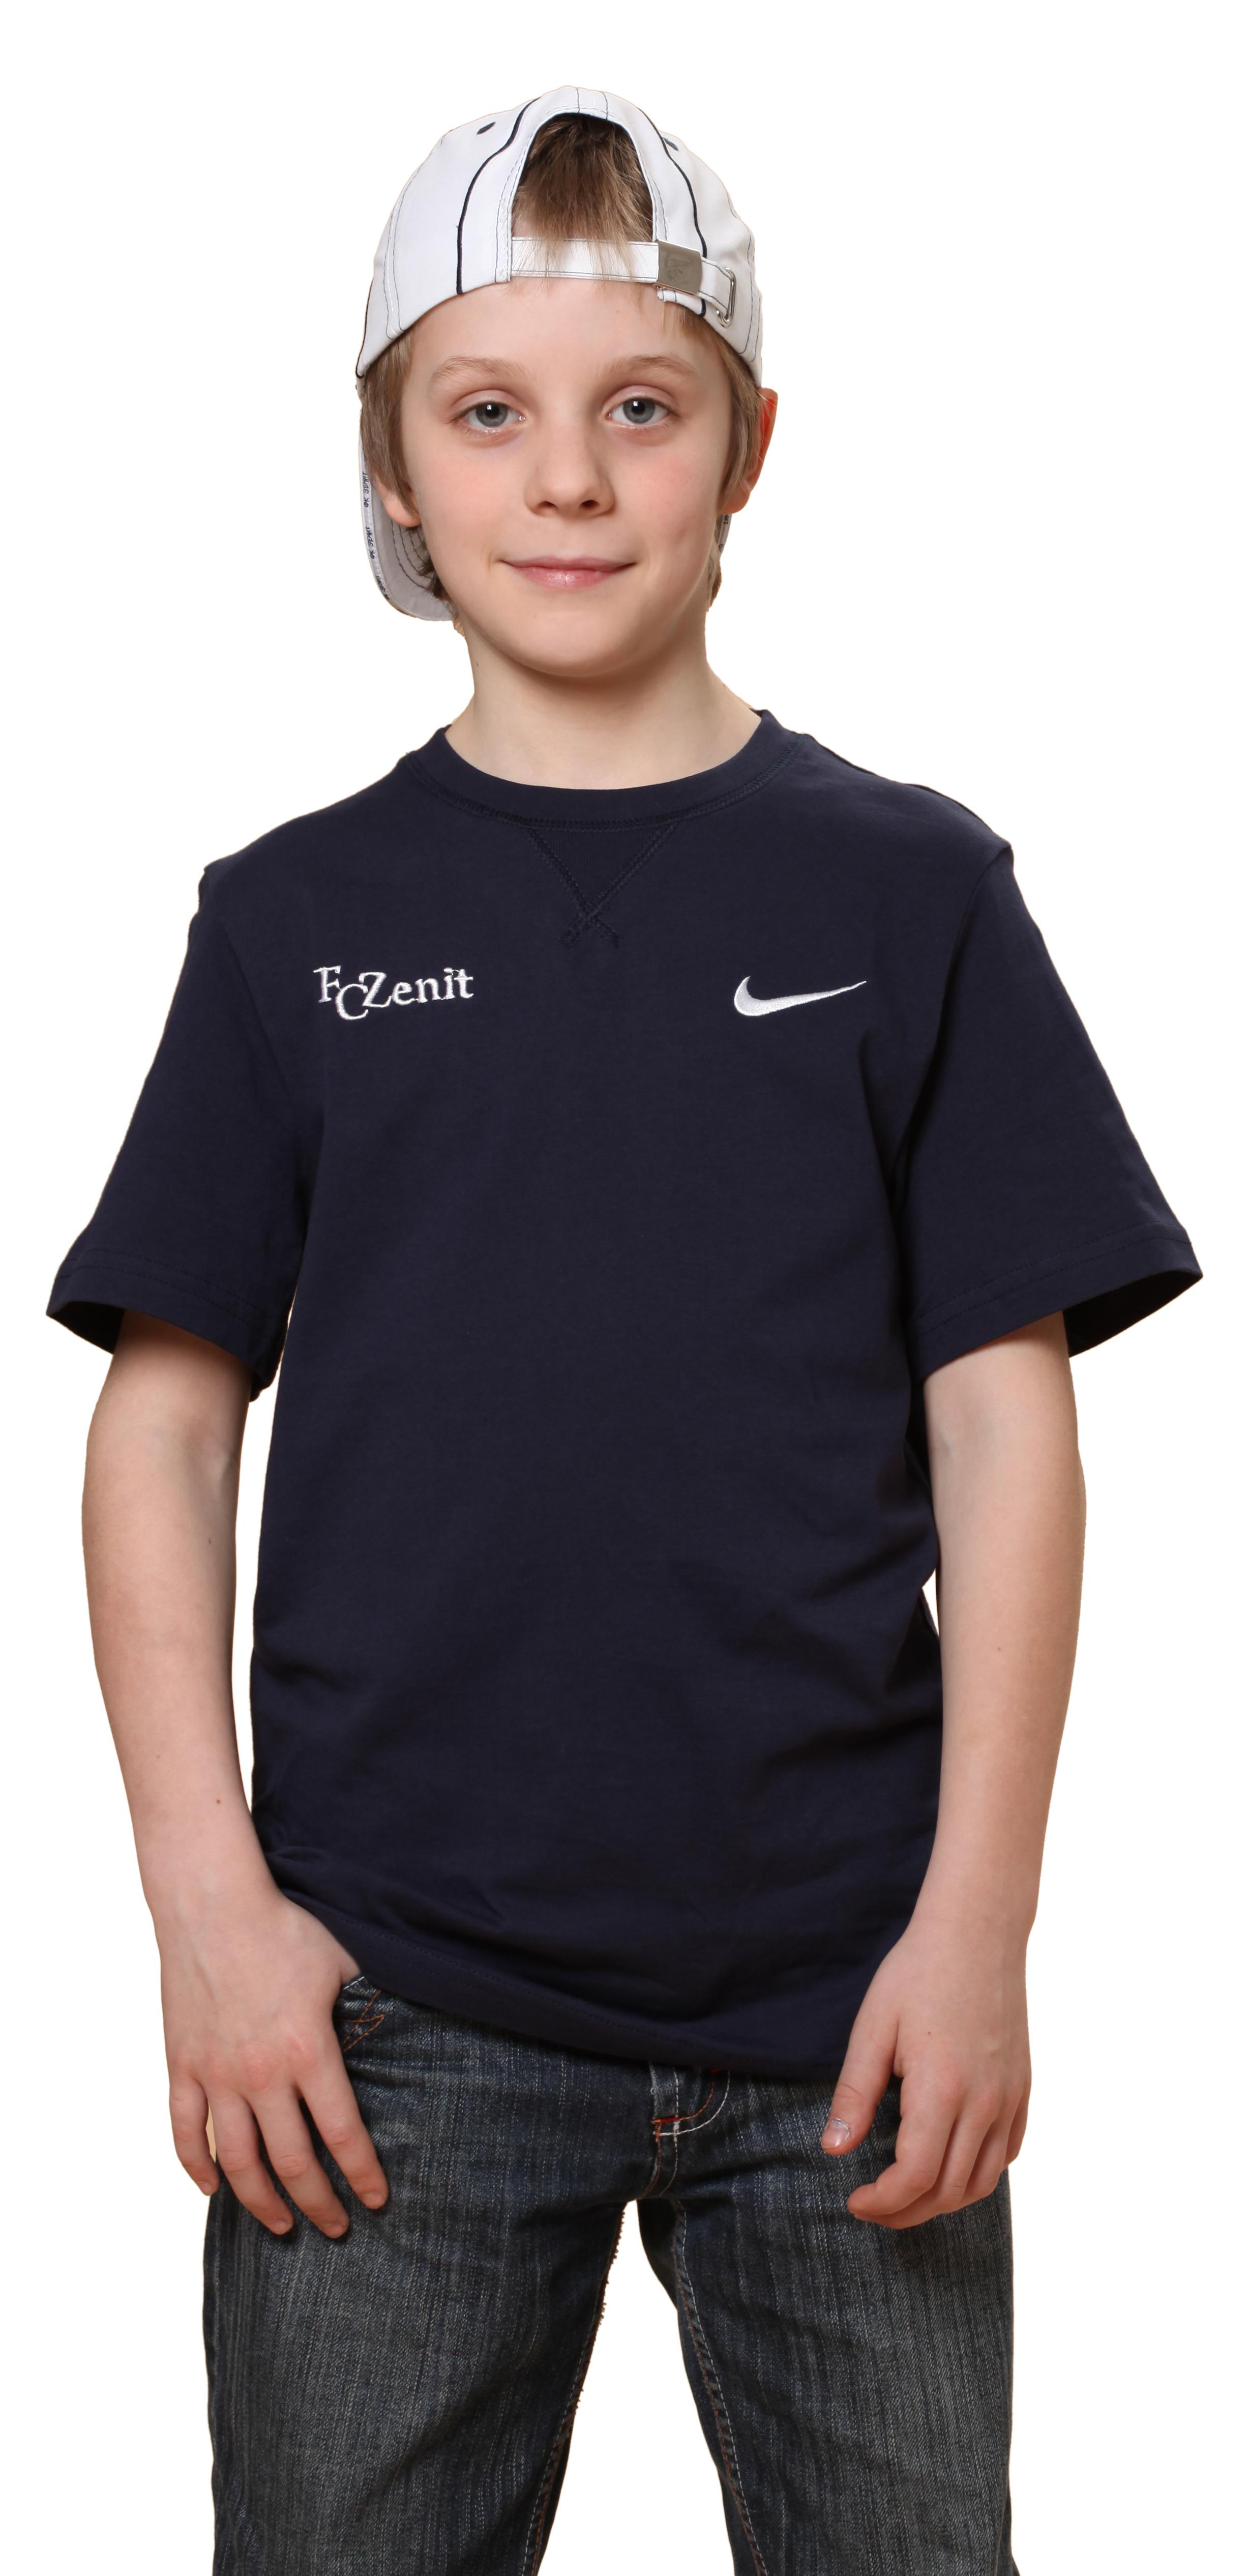 Футболка Nike Swoosh Crew, Цвет-Синий, Размер-L